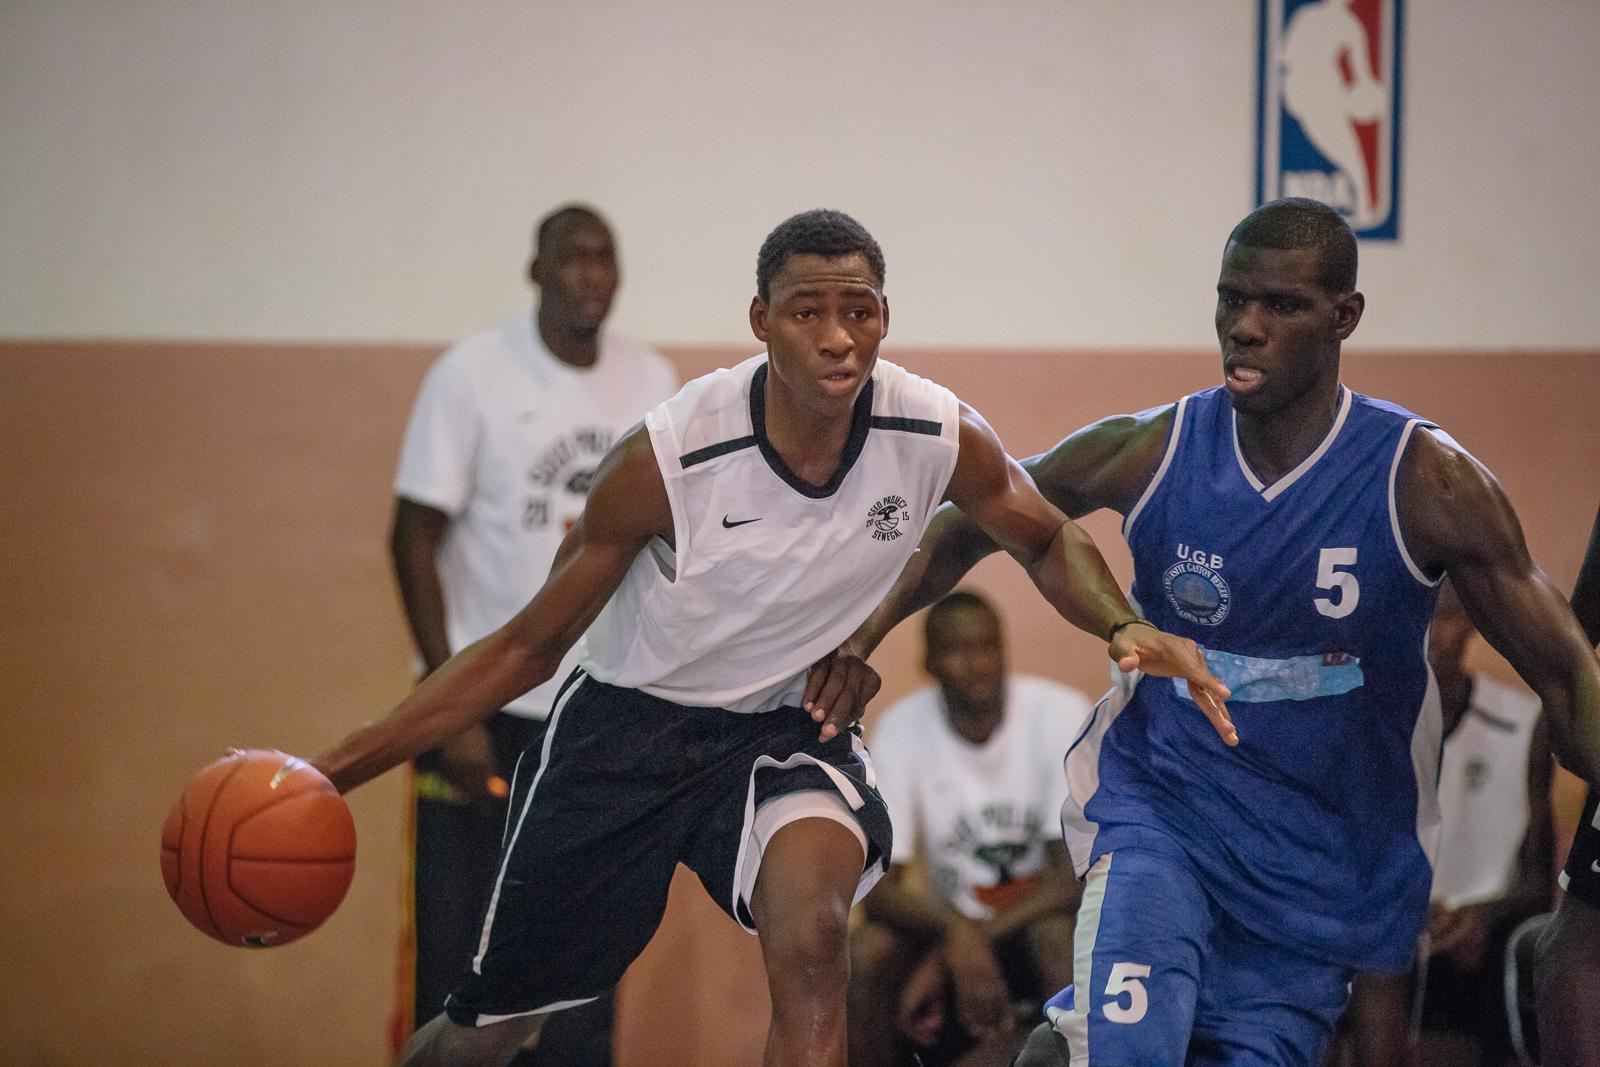 0520_20150531_Seed Academy_thiès_Senegal©KevinCouliau.jpg